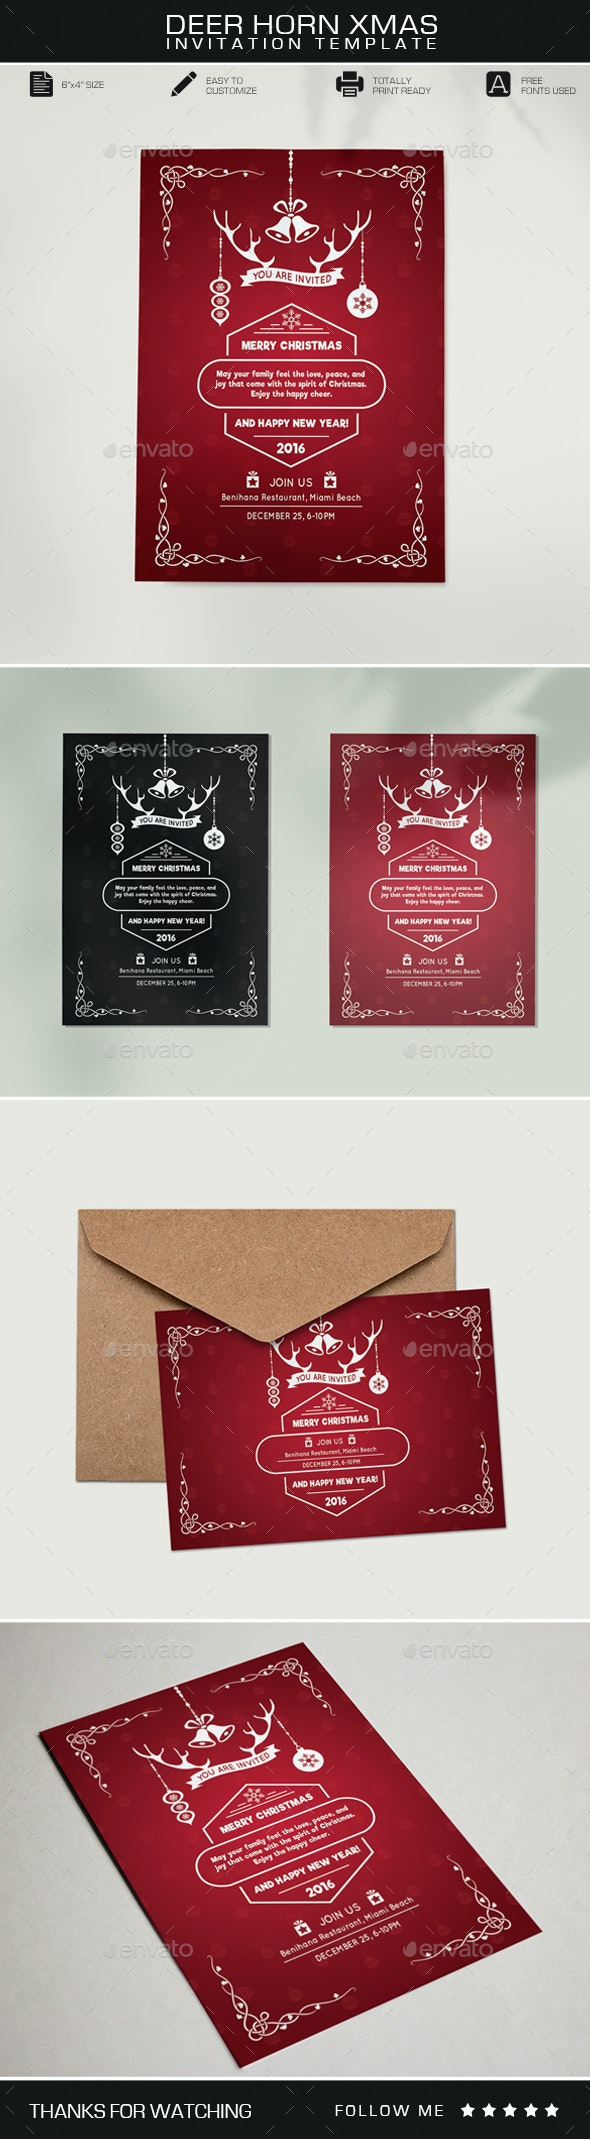 Deer Horn Christmas Invitation - Invitations Cards & Invites